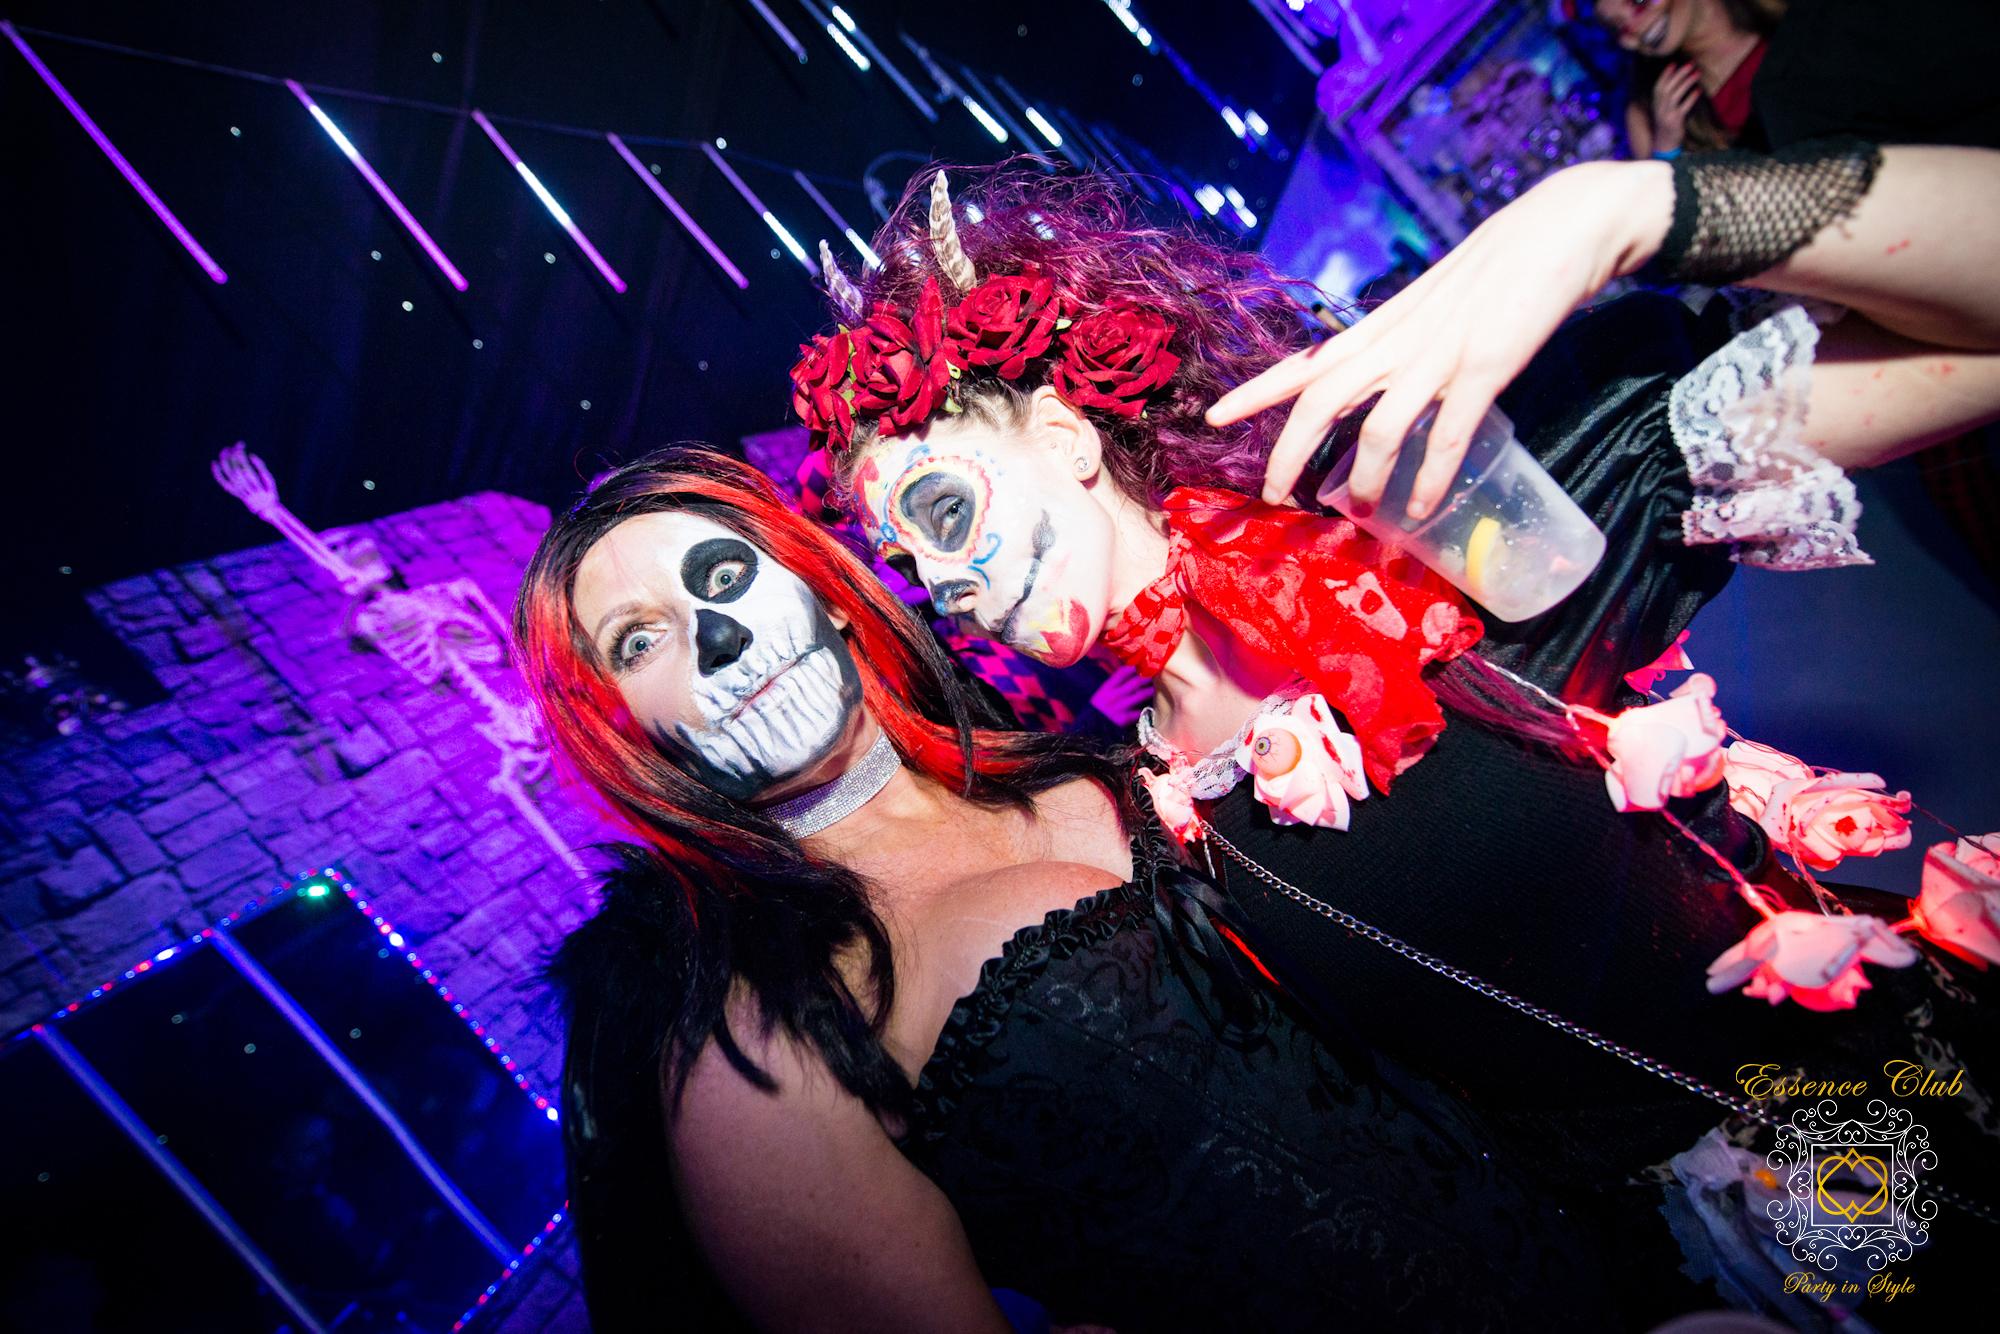 Essence Club Halloween party